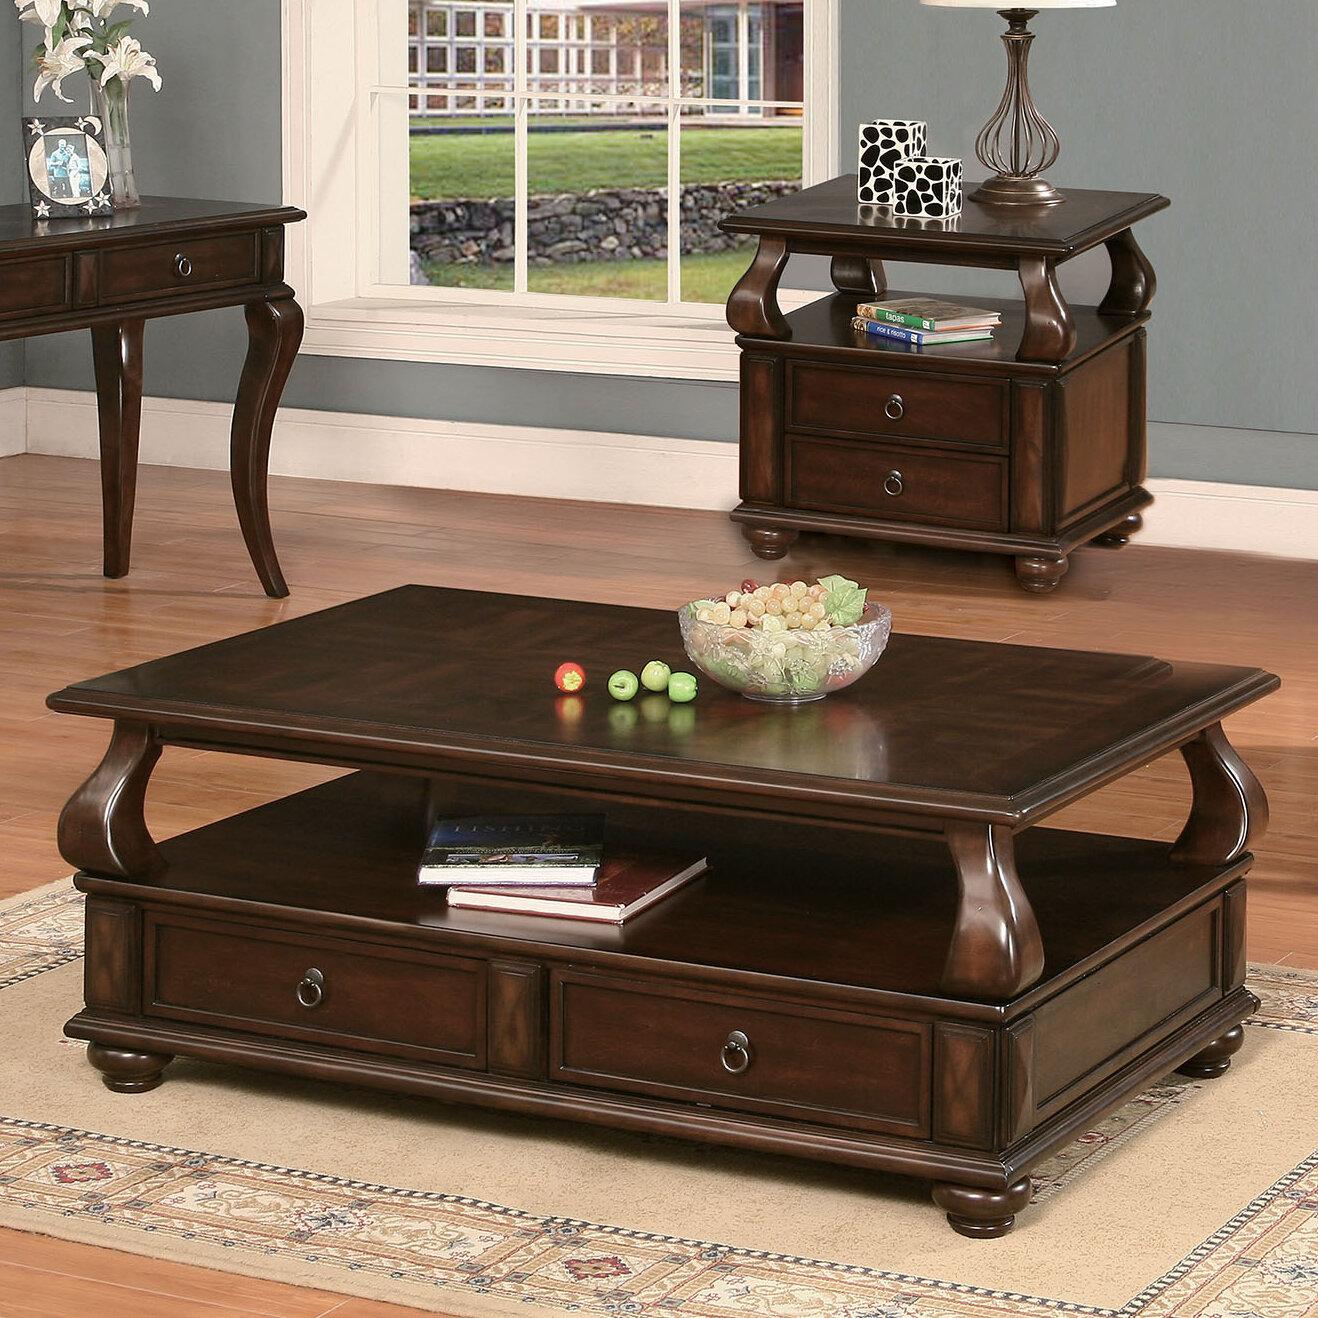 Coffee Table 3 Piece Sets.Chulmleigh 3 Piece Coffee Table Set